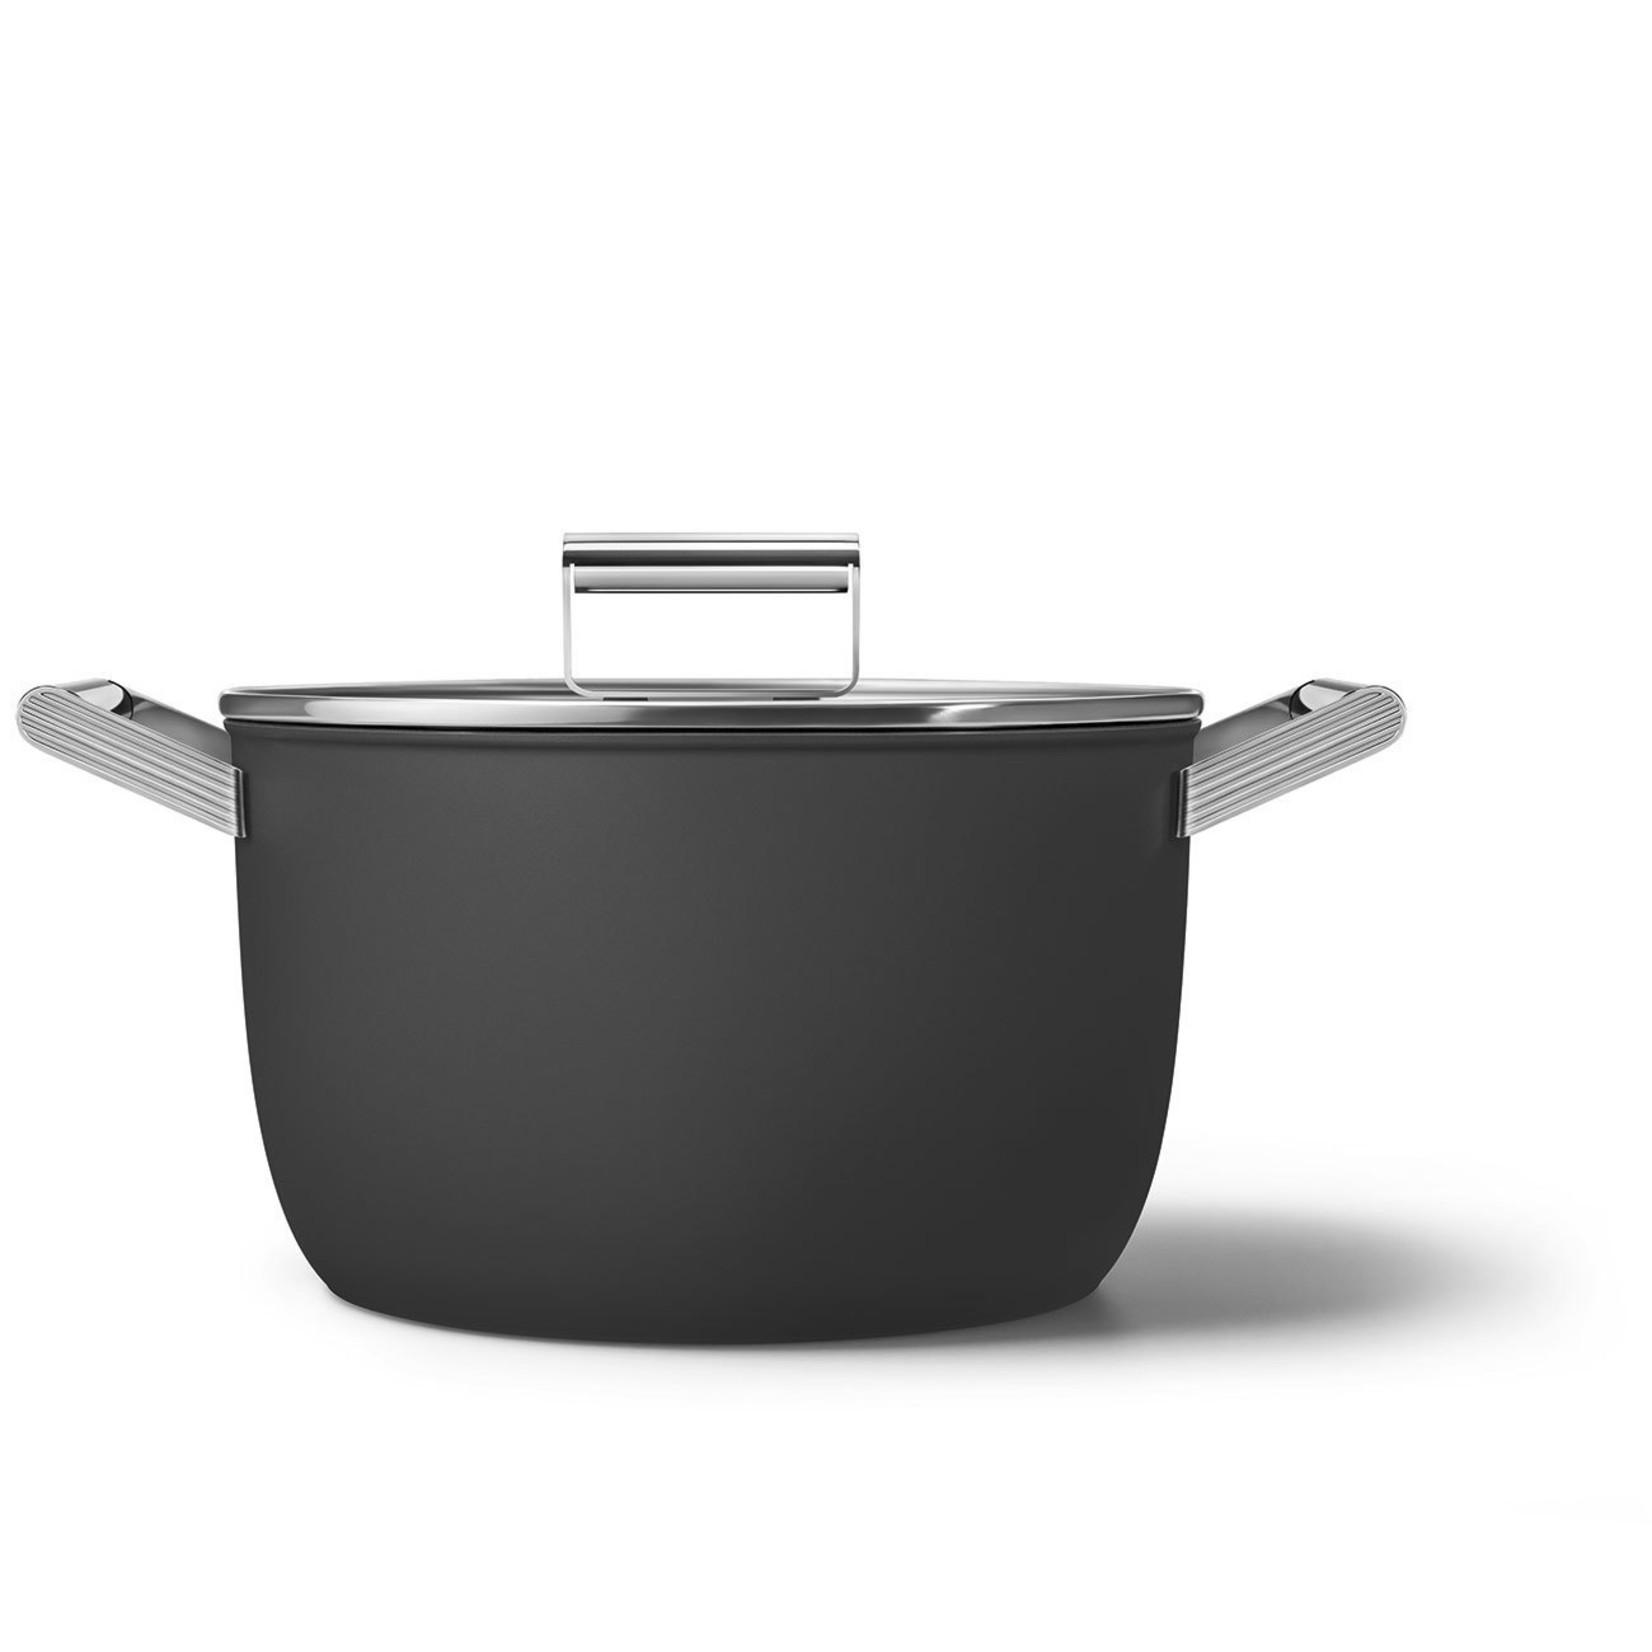 Smeg SMEG Kookpan met deksel 26 cm, anti-aanbaklaag, zwart mat